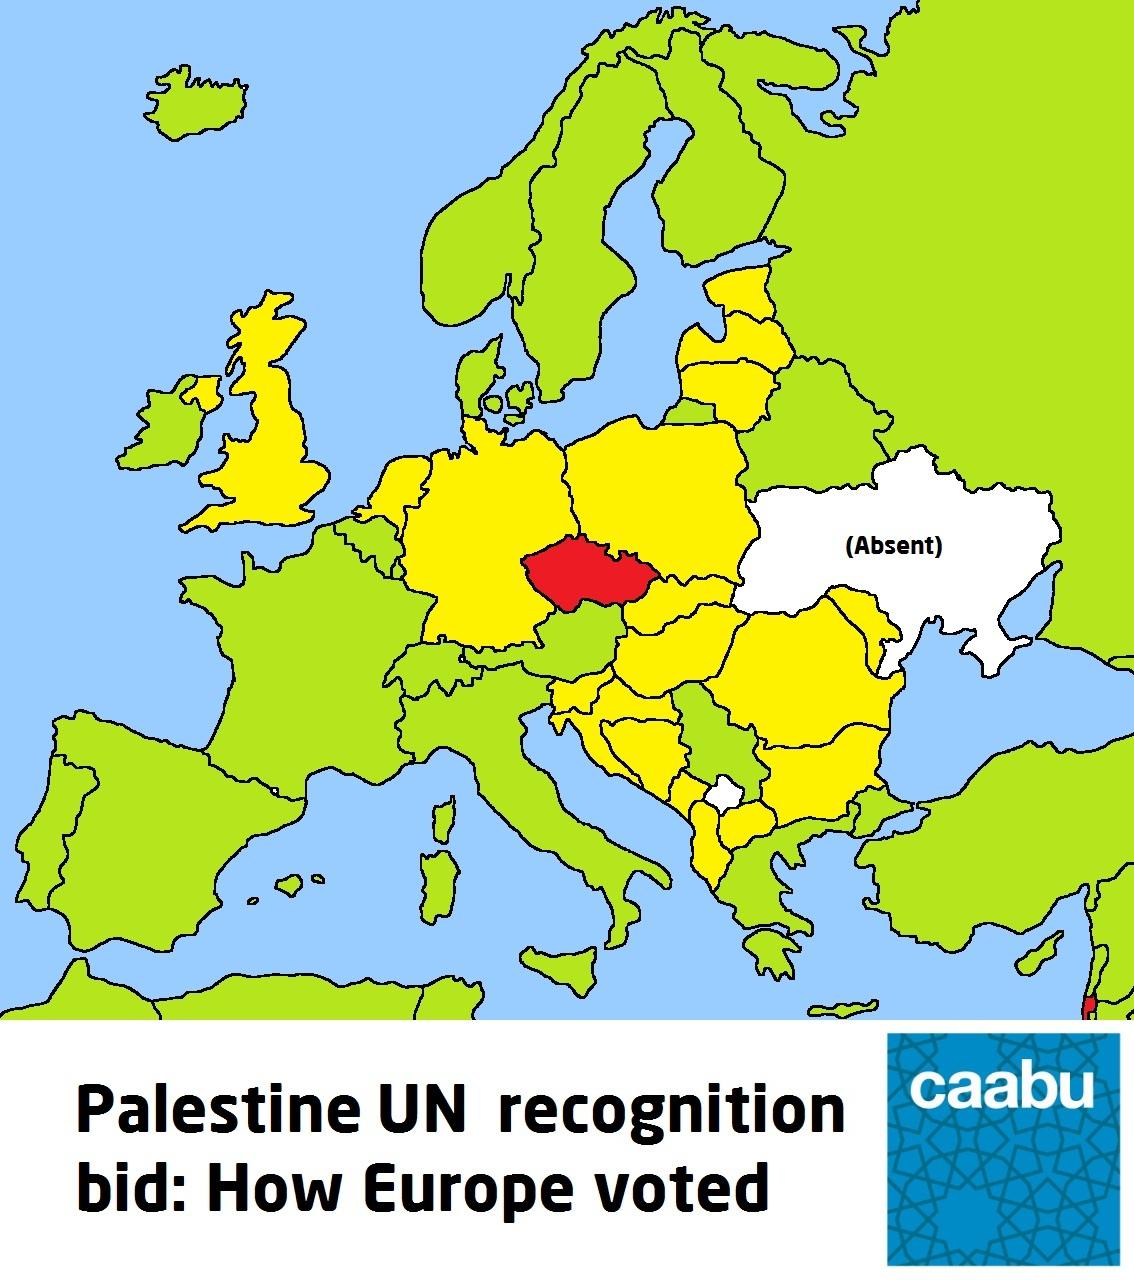 map europe and palestines un bid